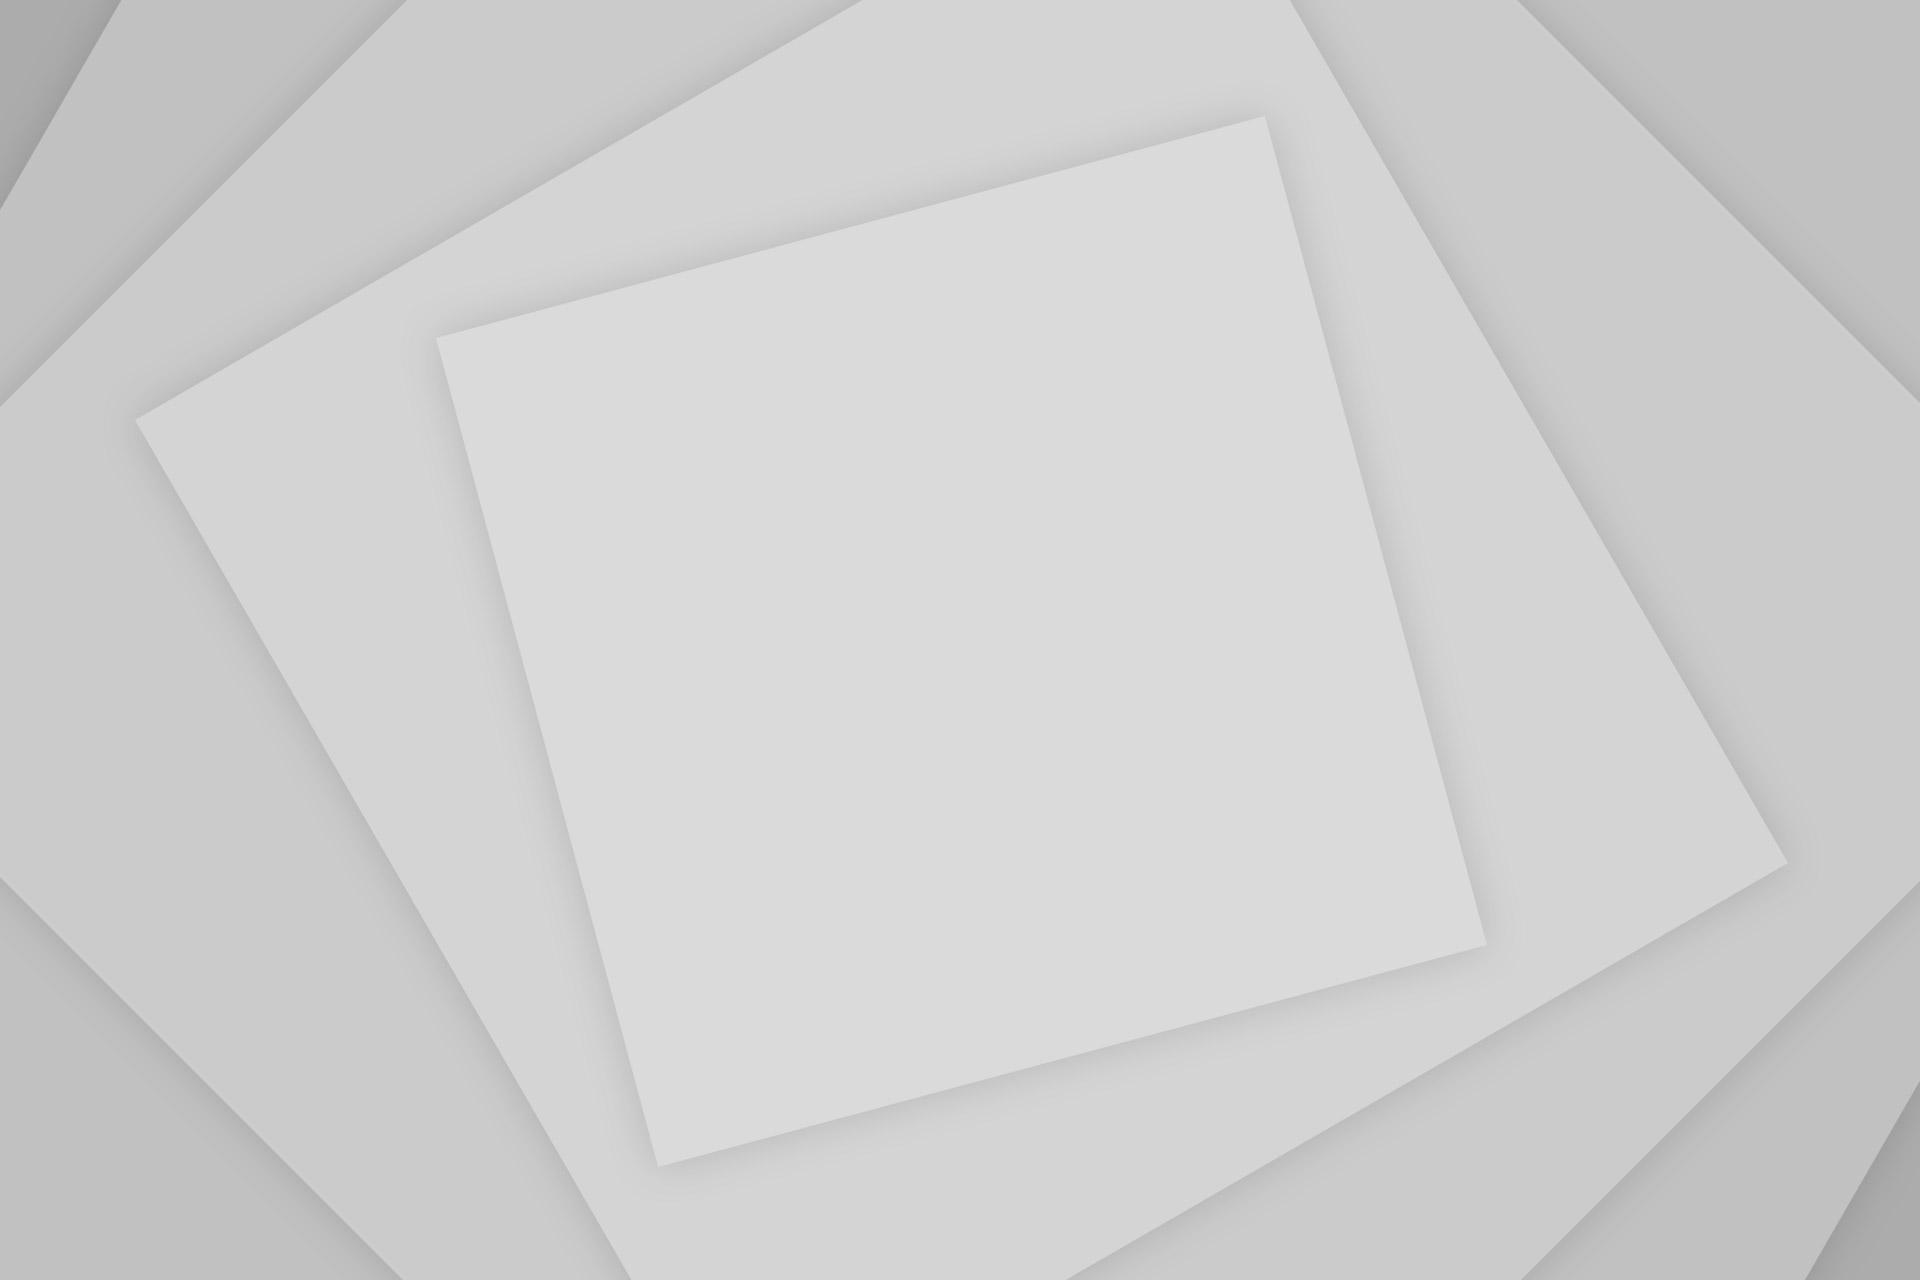 Lovense Lush 3 Review For 2021